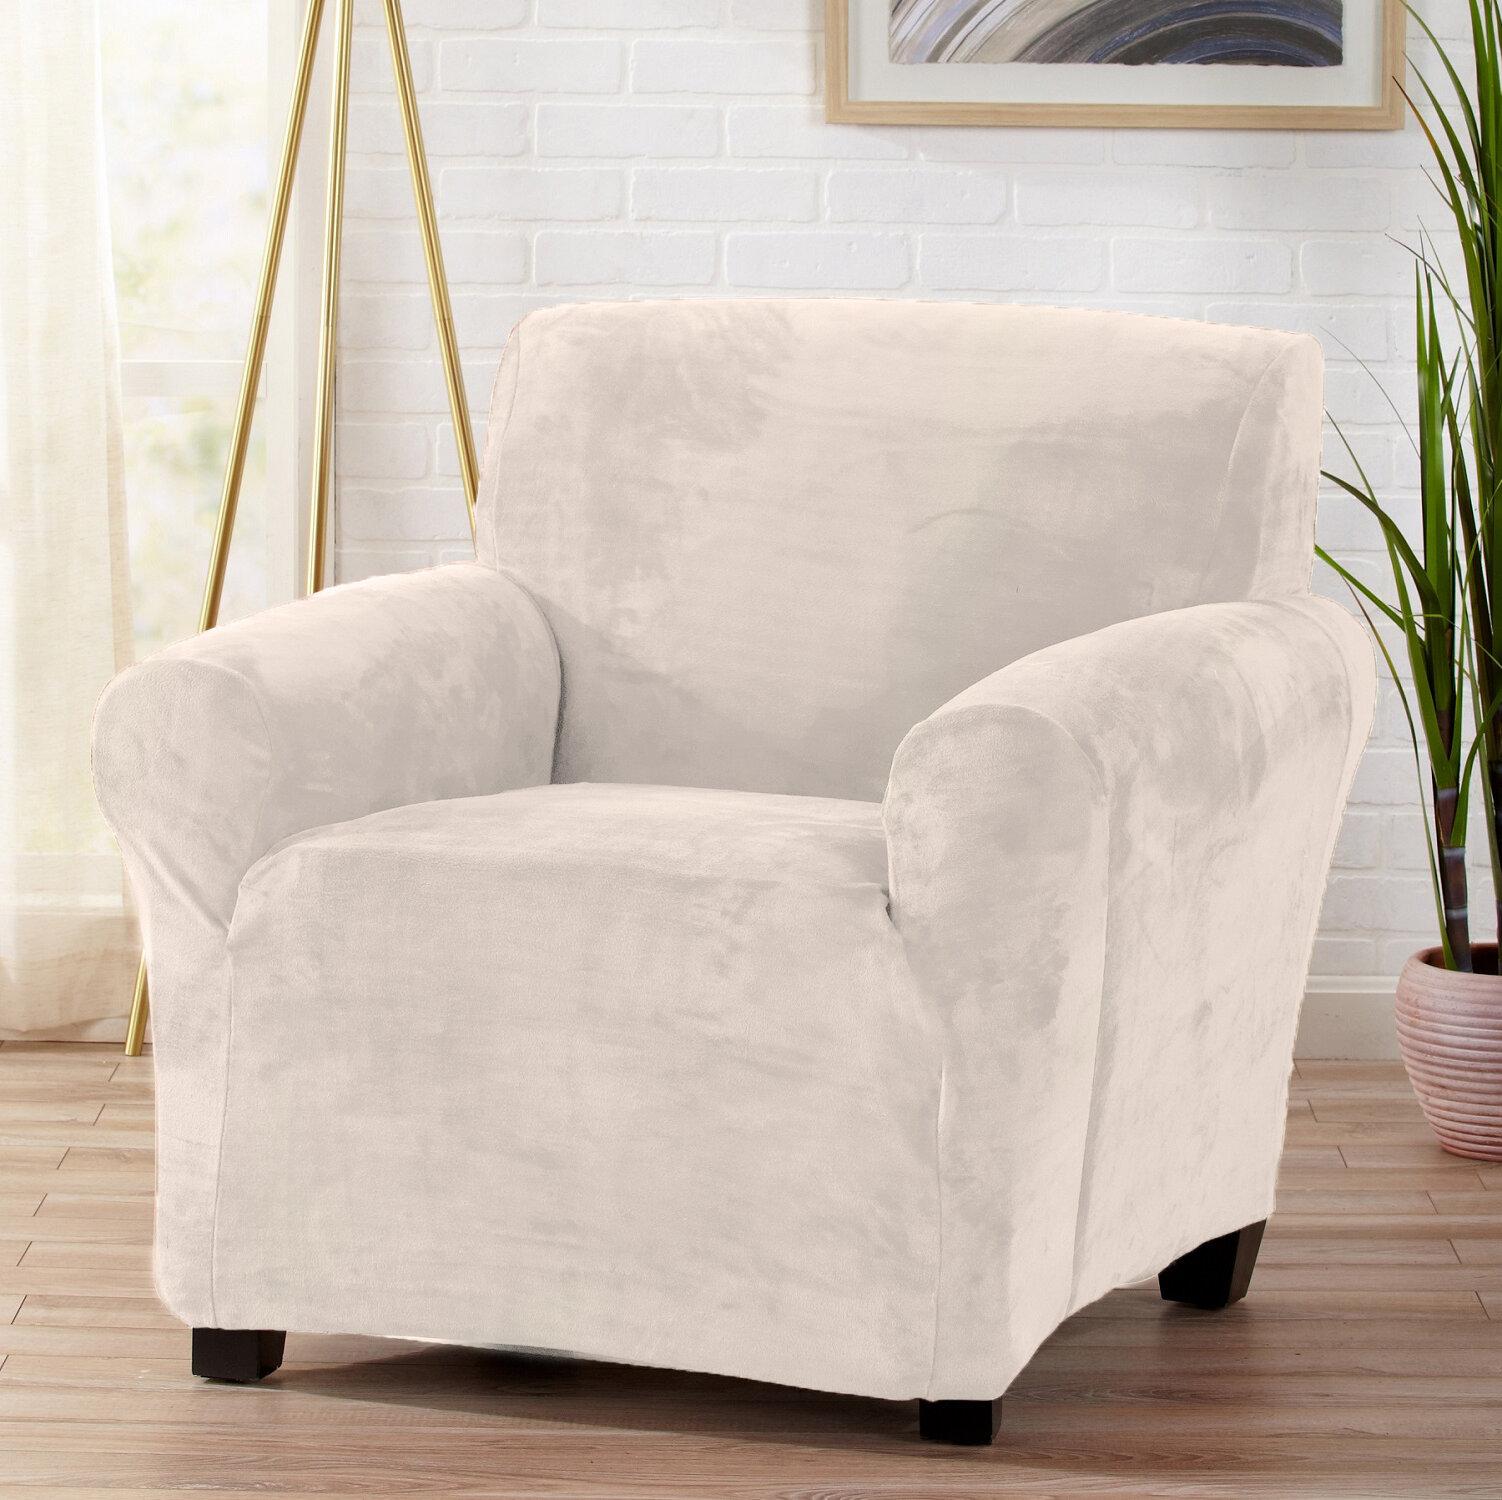 Symple Stuff Velvet Plush Form Fit Stretch T Cushion Armchair Slipcover Reviews Wayfair